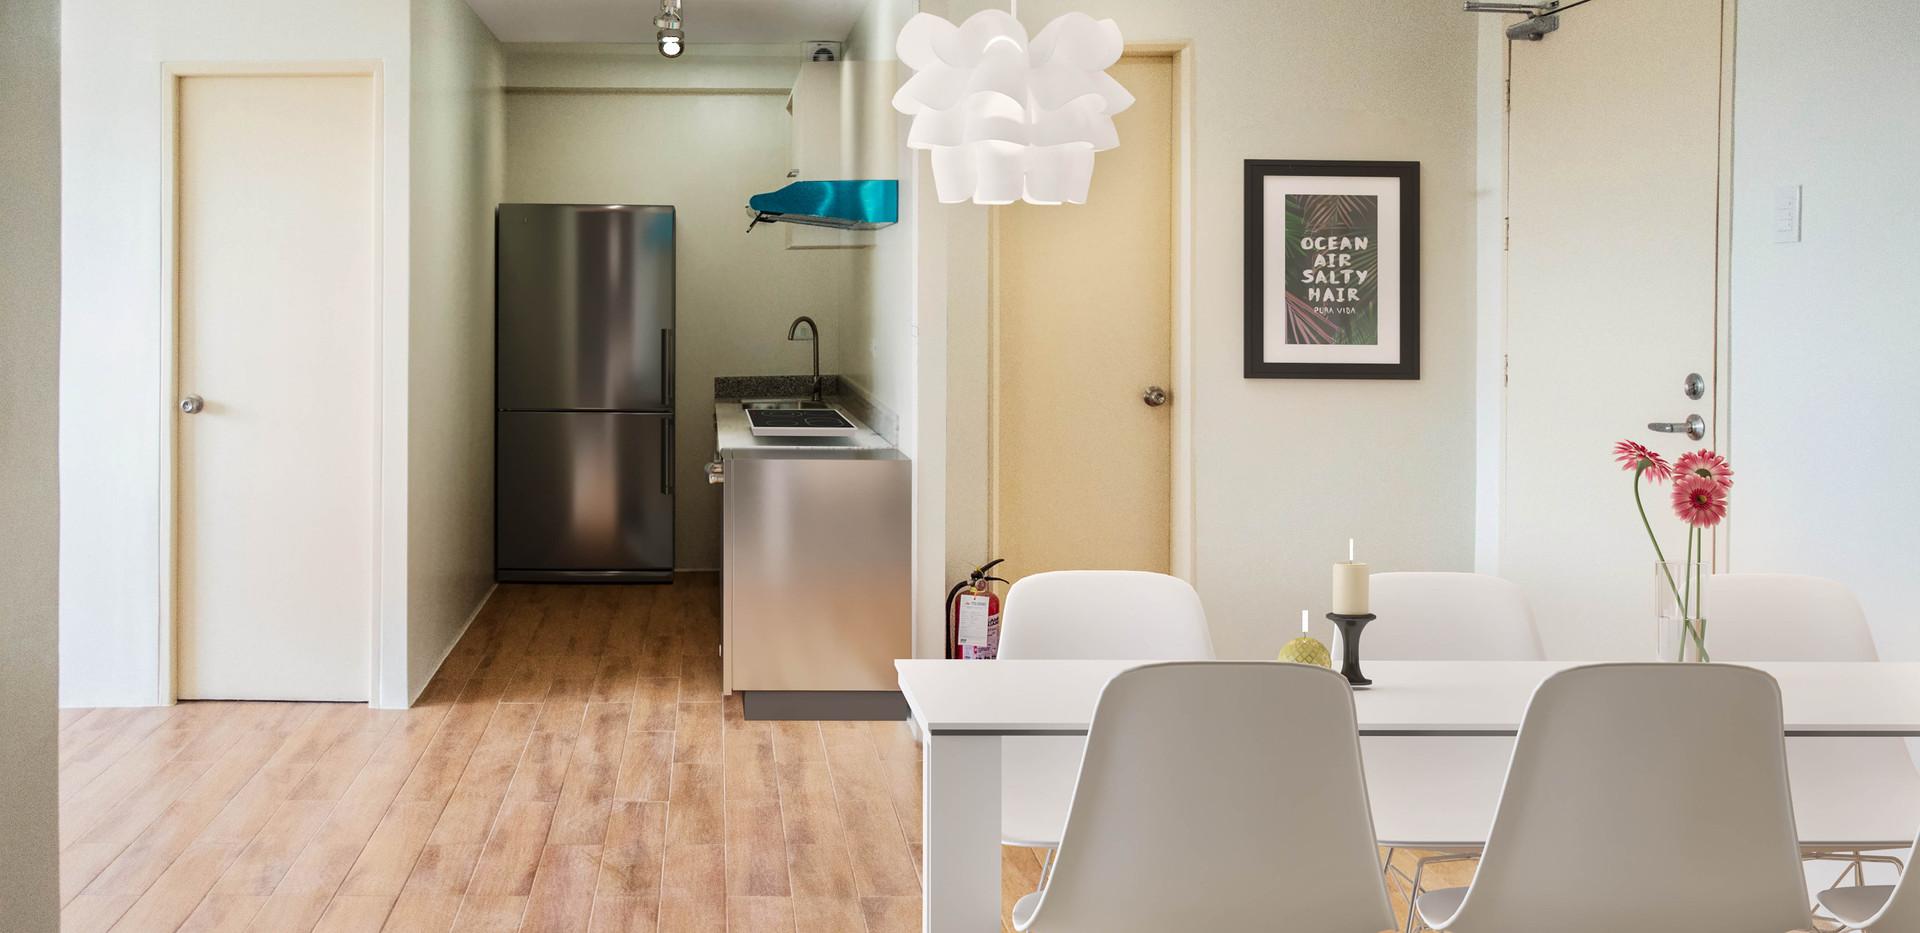 3-Bedroom Unit Dining Area Overlooking Kitchen Area